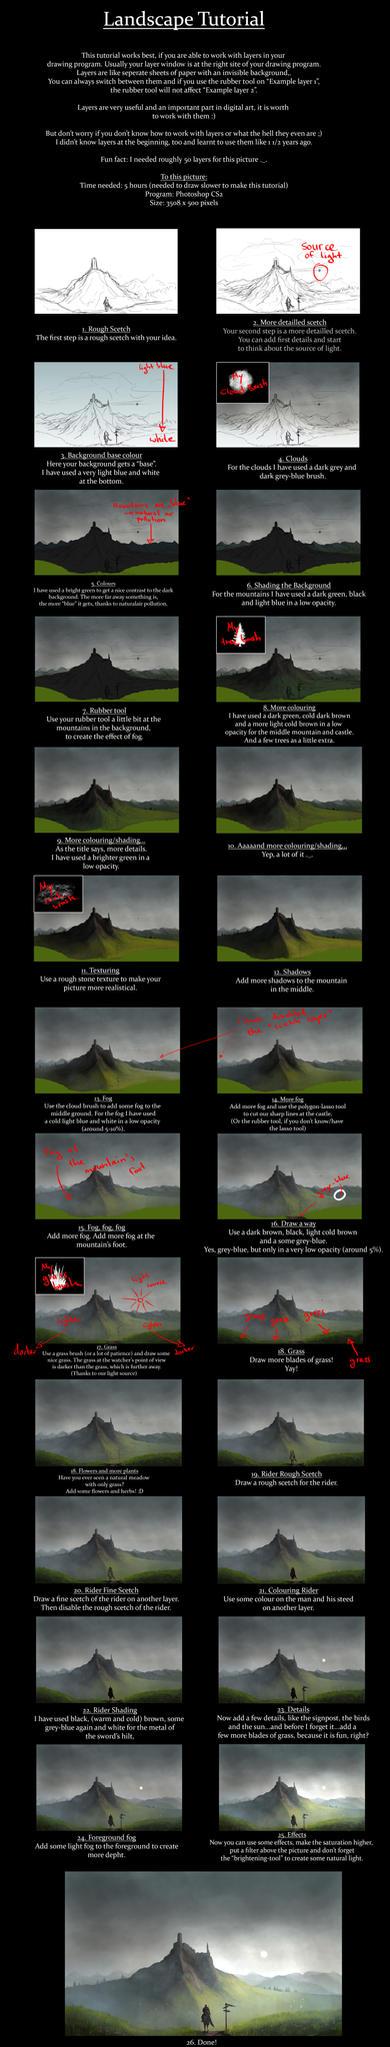 Landscape tutorial by Kimberly-SC